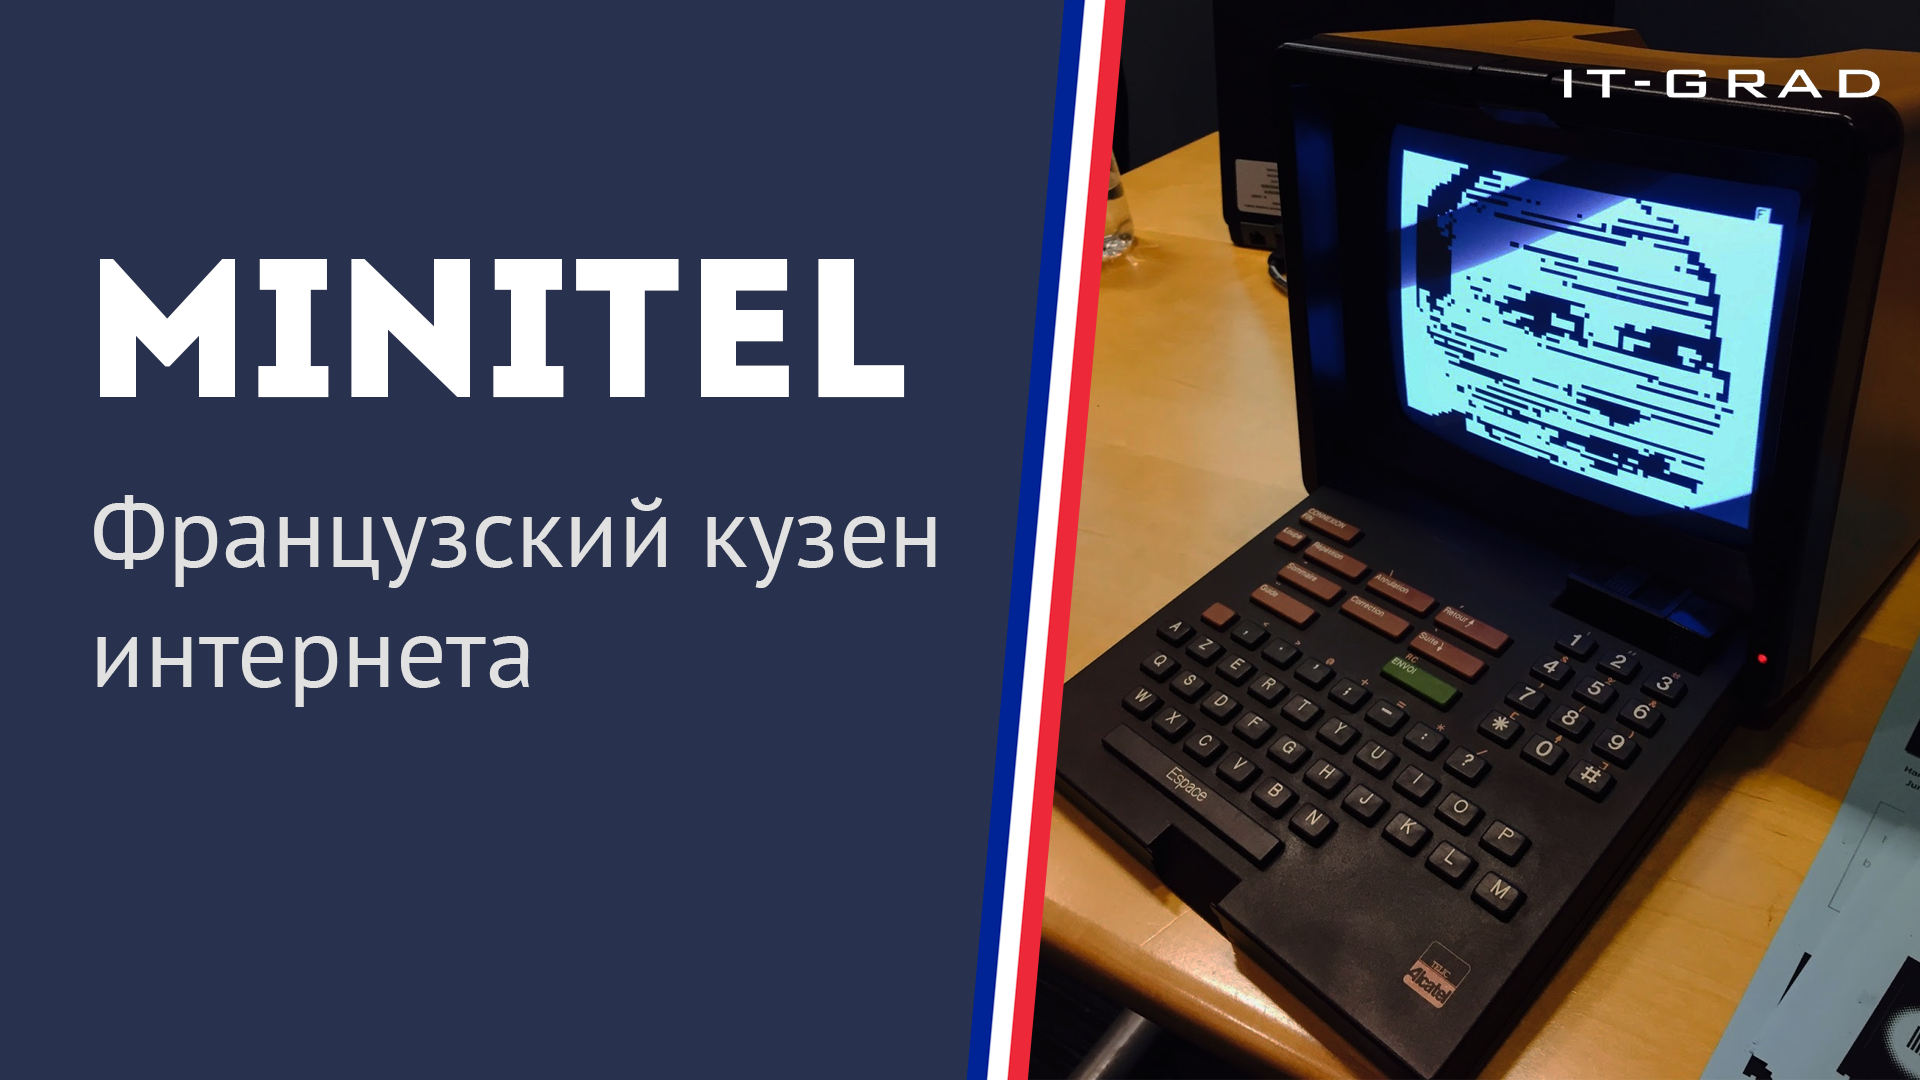 Minitel: французский кузен интернета